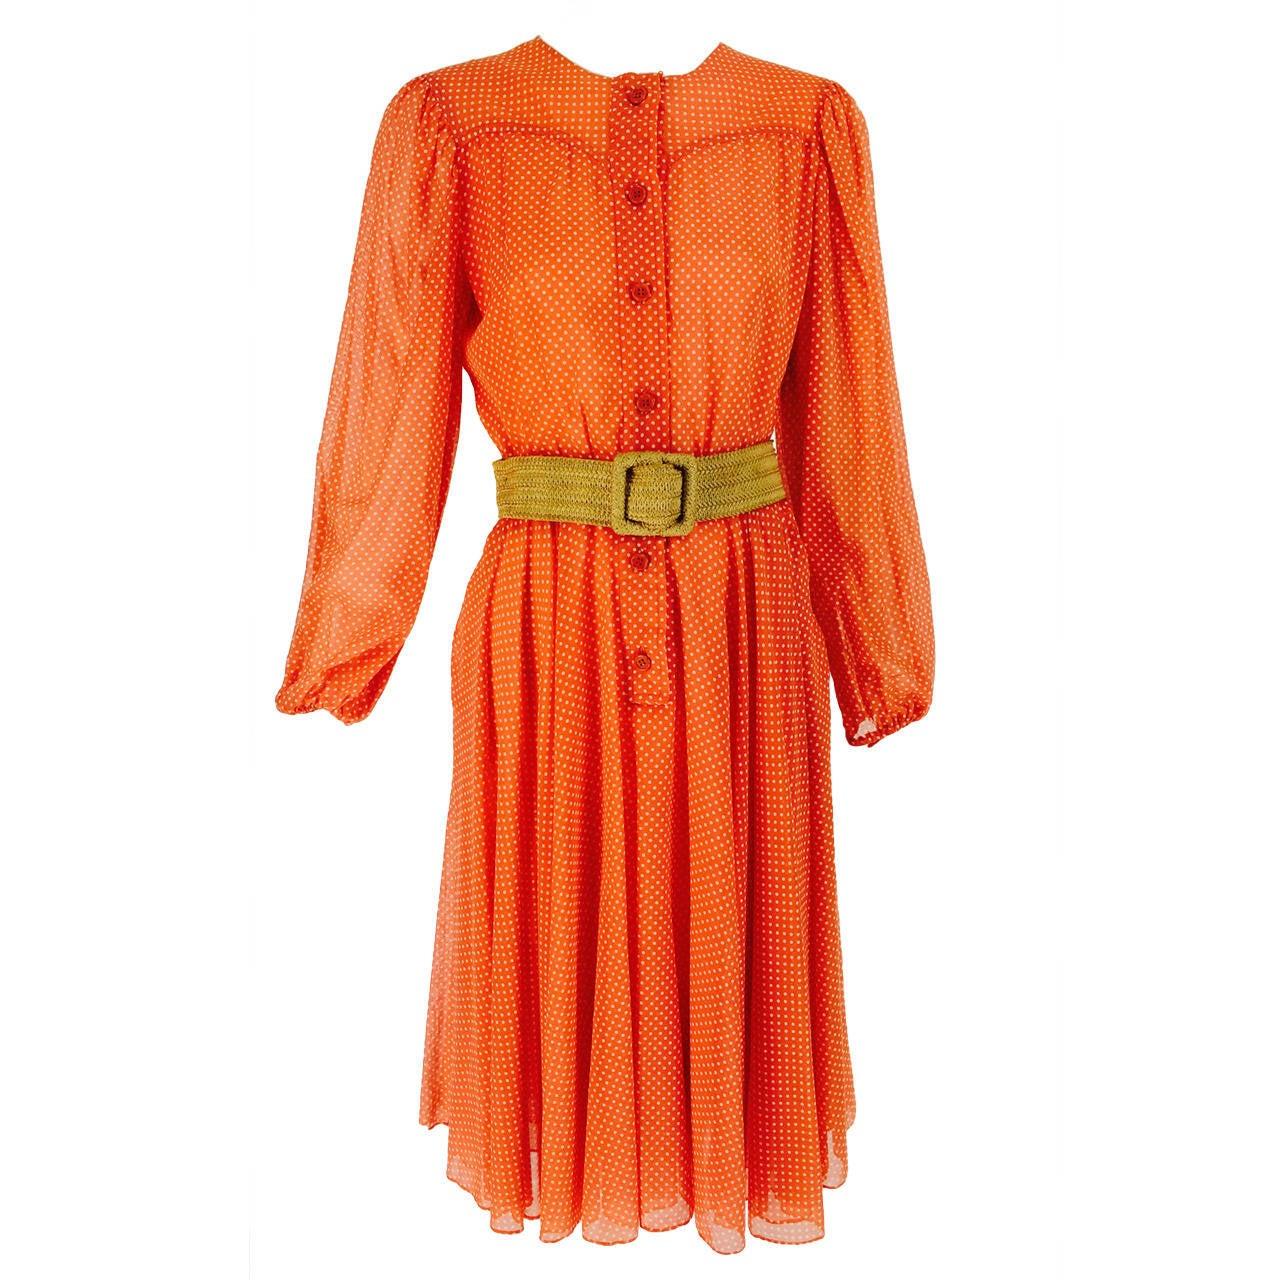 1970s Oscar de la Renta mini dot cotton voile dress